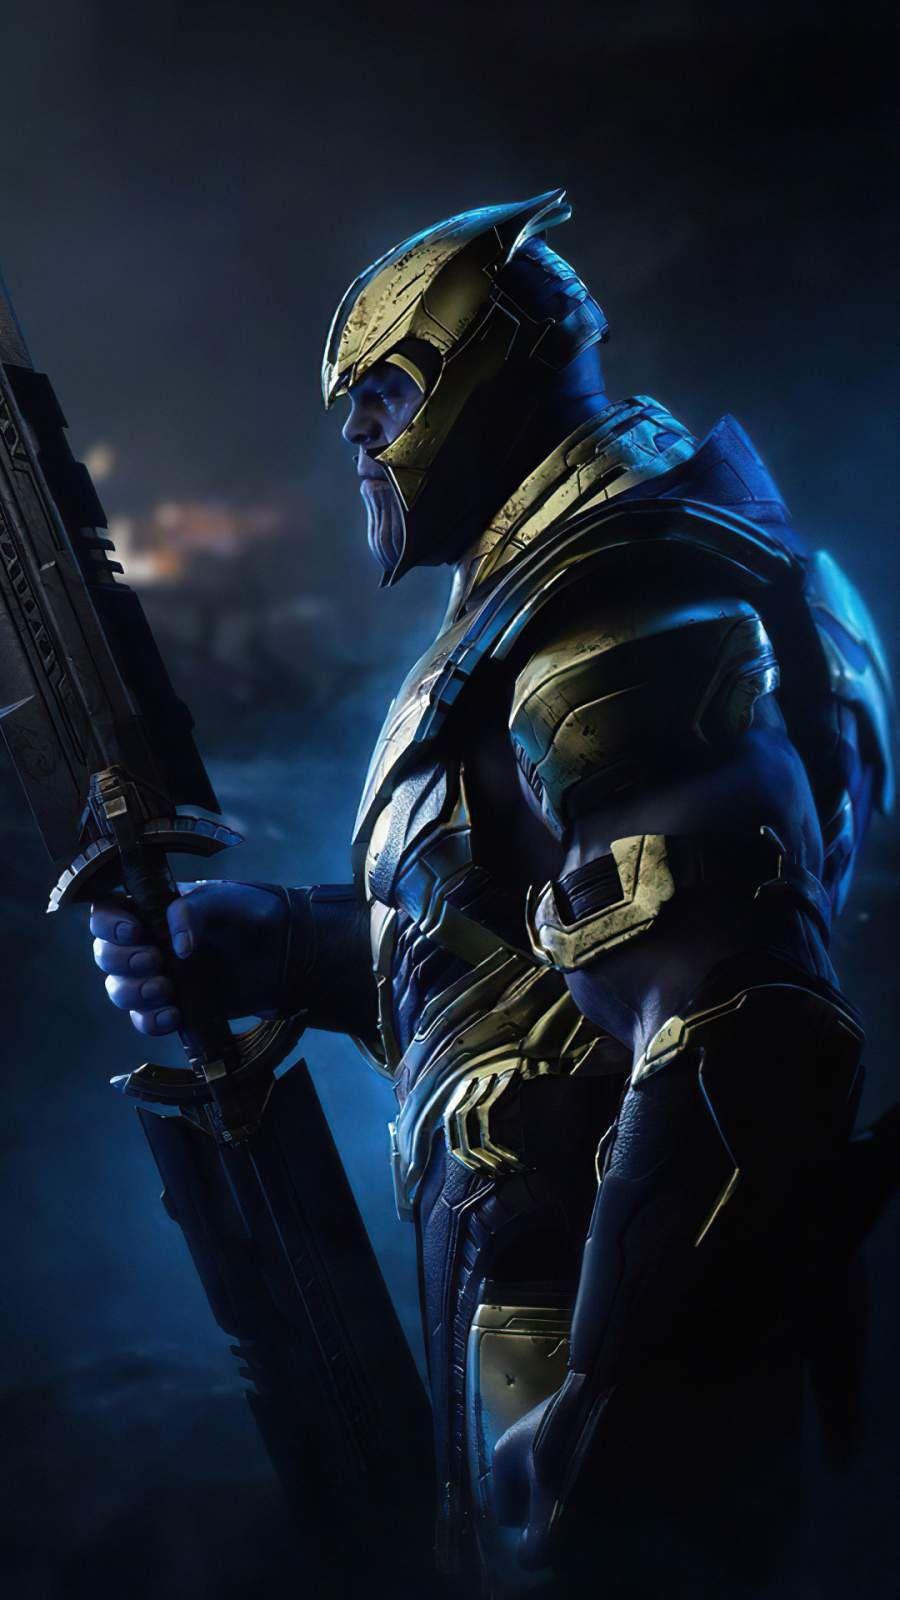 Thanos 4k Iphone Wallpaper In 2020 Marvel Comics Wallpaper Marvel Superhero Posters Marvel Comics Superheroes